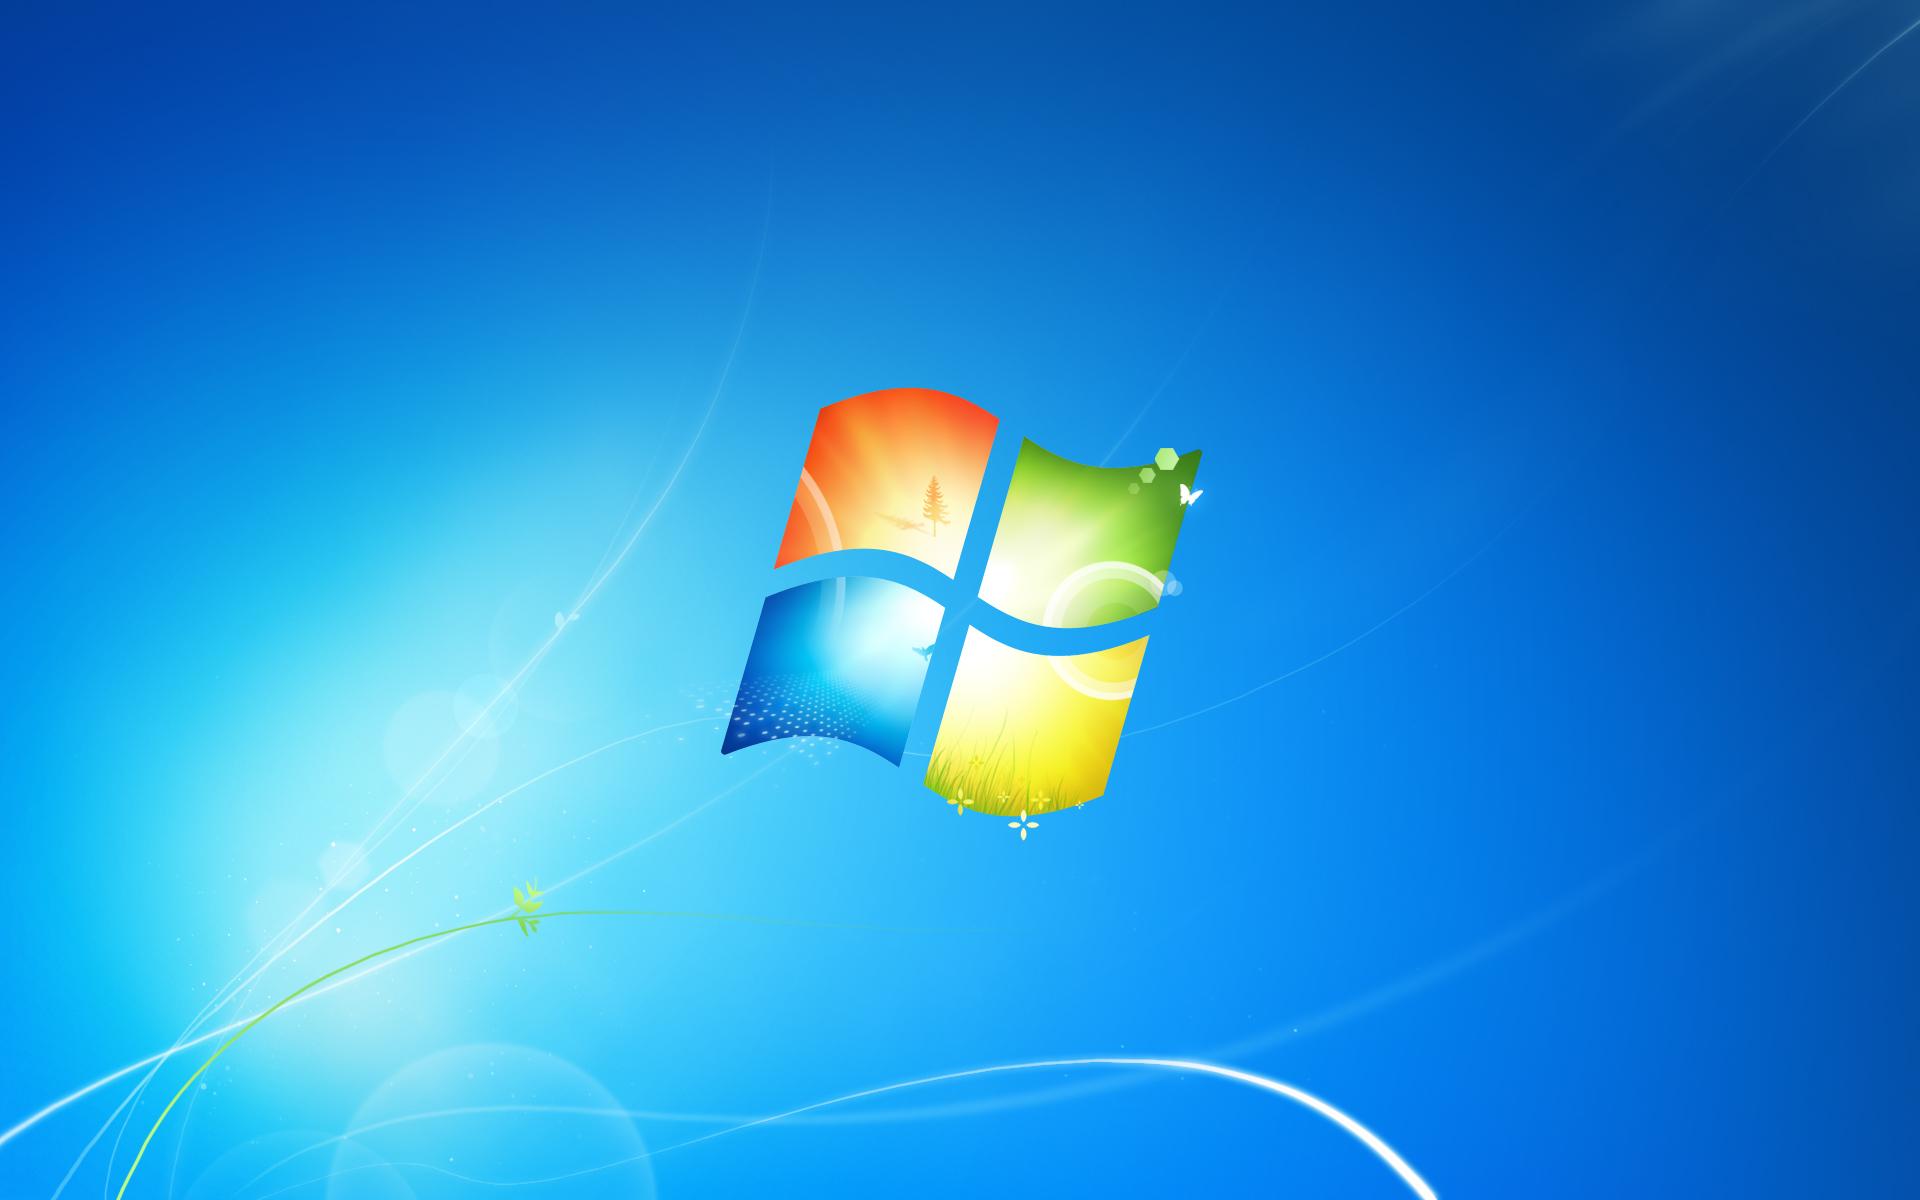 Windows 7 build 7232 VHD Leaked voici le fond du0026#39;u00e9cran officiel ! - Pinnula